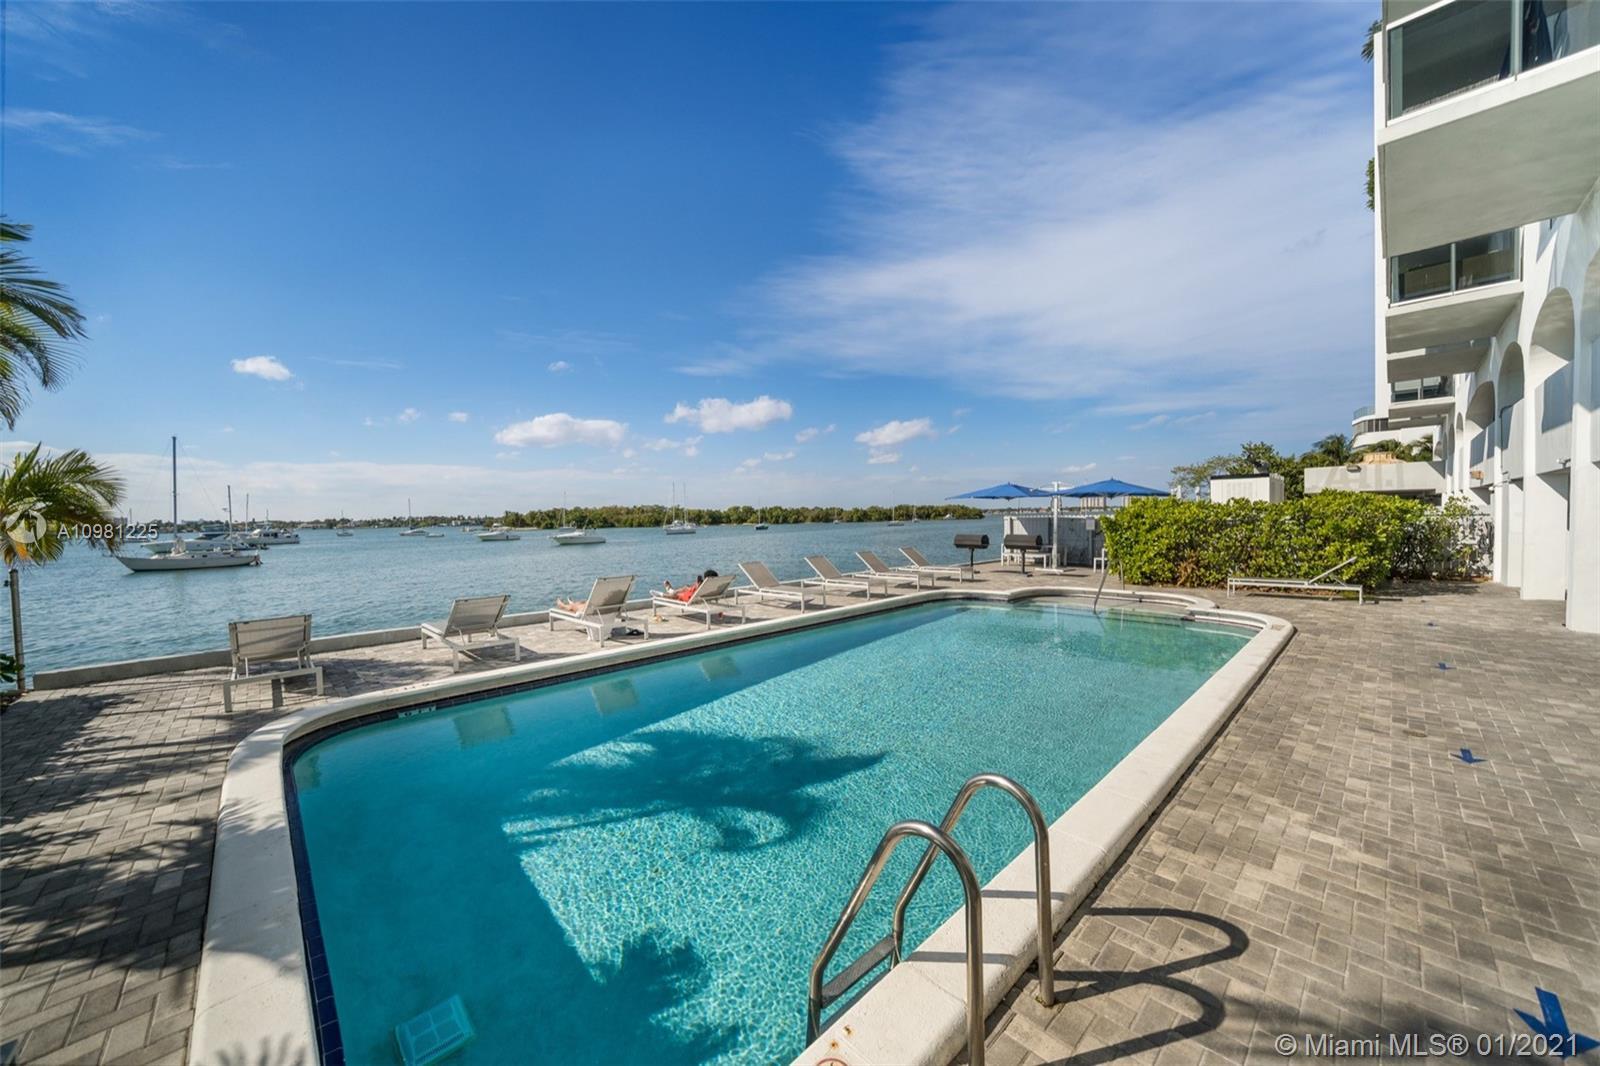 7928 West Dr # 711, North Bay Village, Florida 33141, 2 Bedrooms Bedrooms, ,2 BathroomsBathrooms,Residential,For Sale,7928 West Dr # 711,A10981225